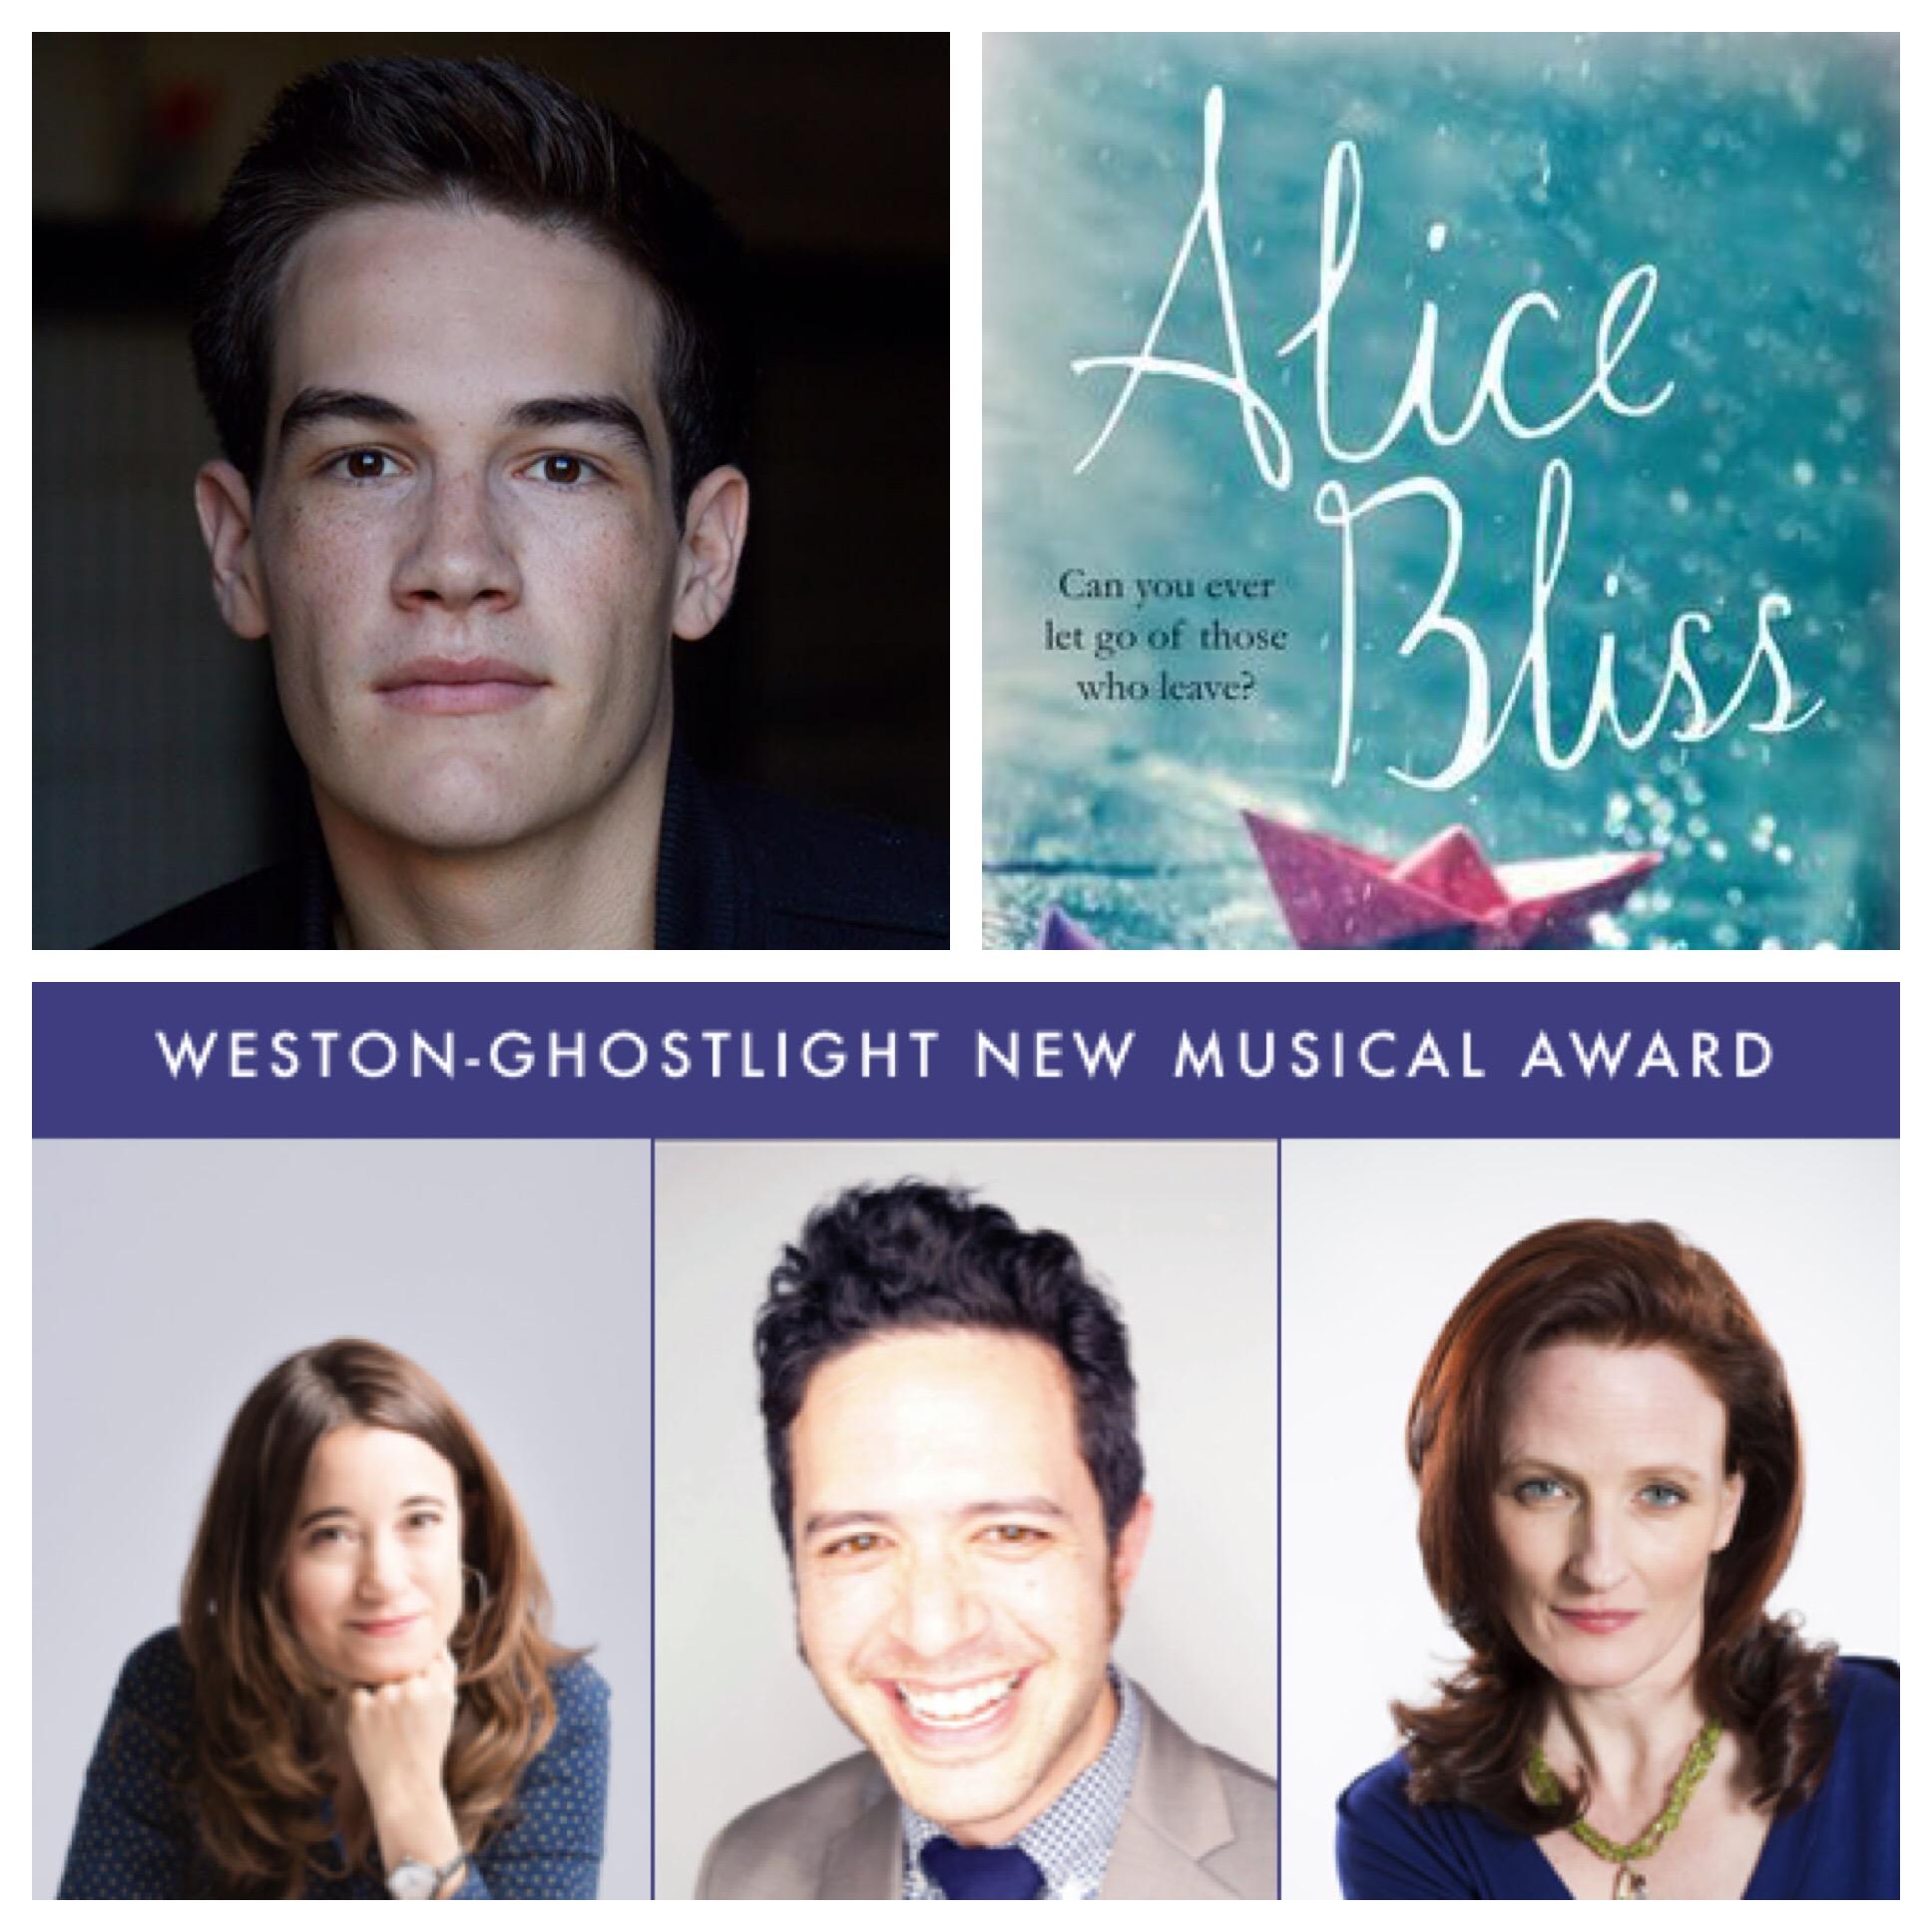 ALICE BLISs - Spring 2019 - Trevor will be playing 'Henry' in the Weston-Ghostlight New Musical Award winning musical, Alice Bliss.For more info on the project: https://www.broadwayworld.com/vermont/article/Weston-Playhouse-Announces-Cast-For-ALICE-BLISS-20190301